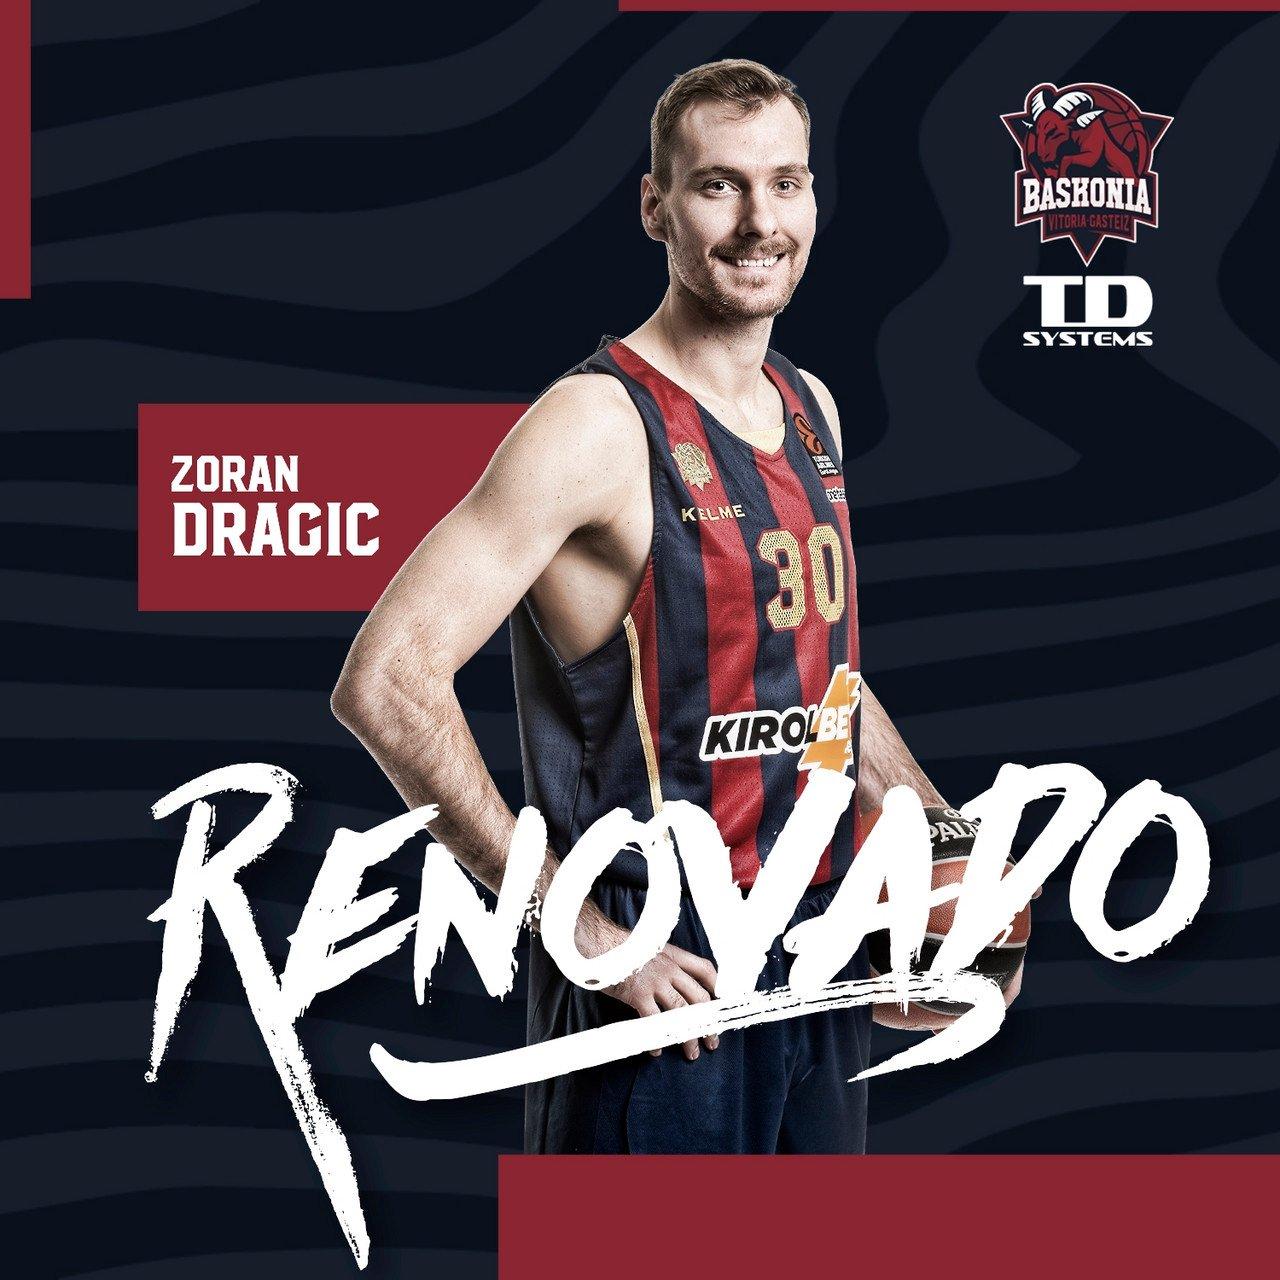 Zoran Dragic, baskonista hasta 2021